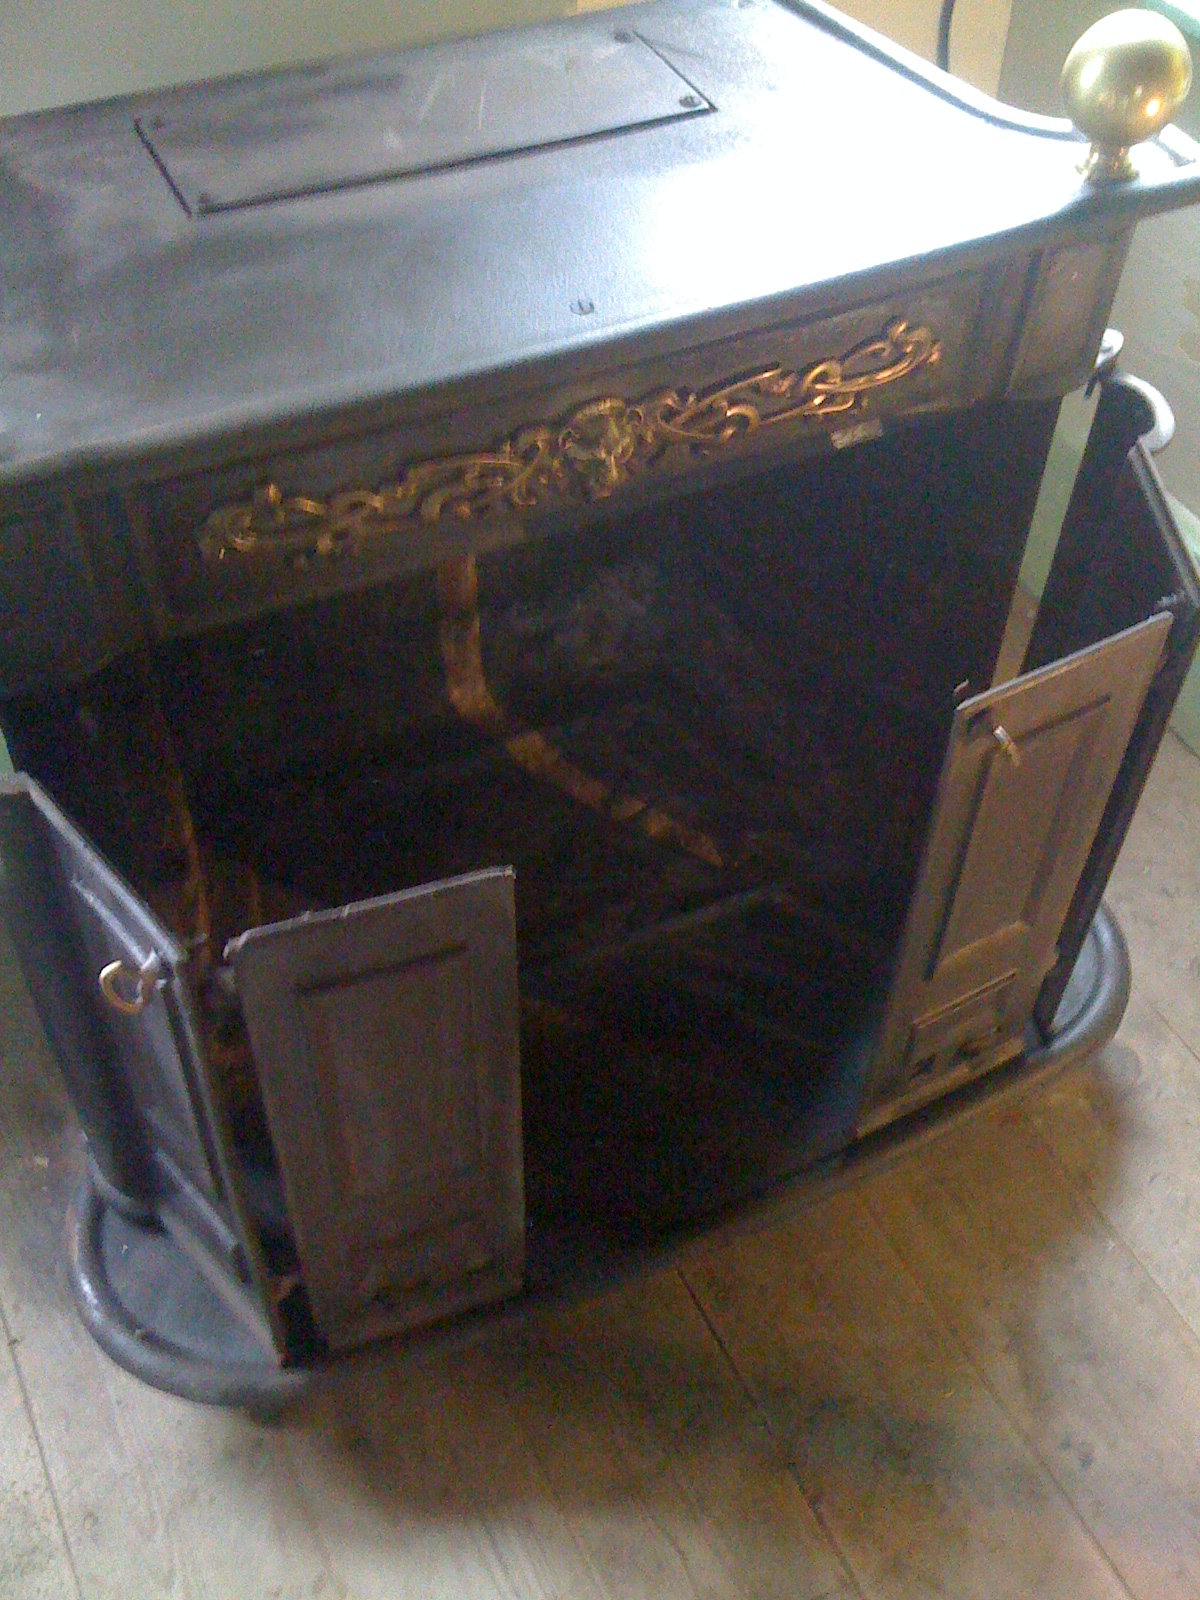 Poele Godin Colonial Godin Stoves Wood Burners Archives Lawton Imports